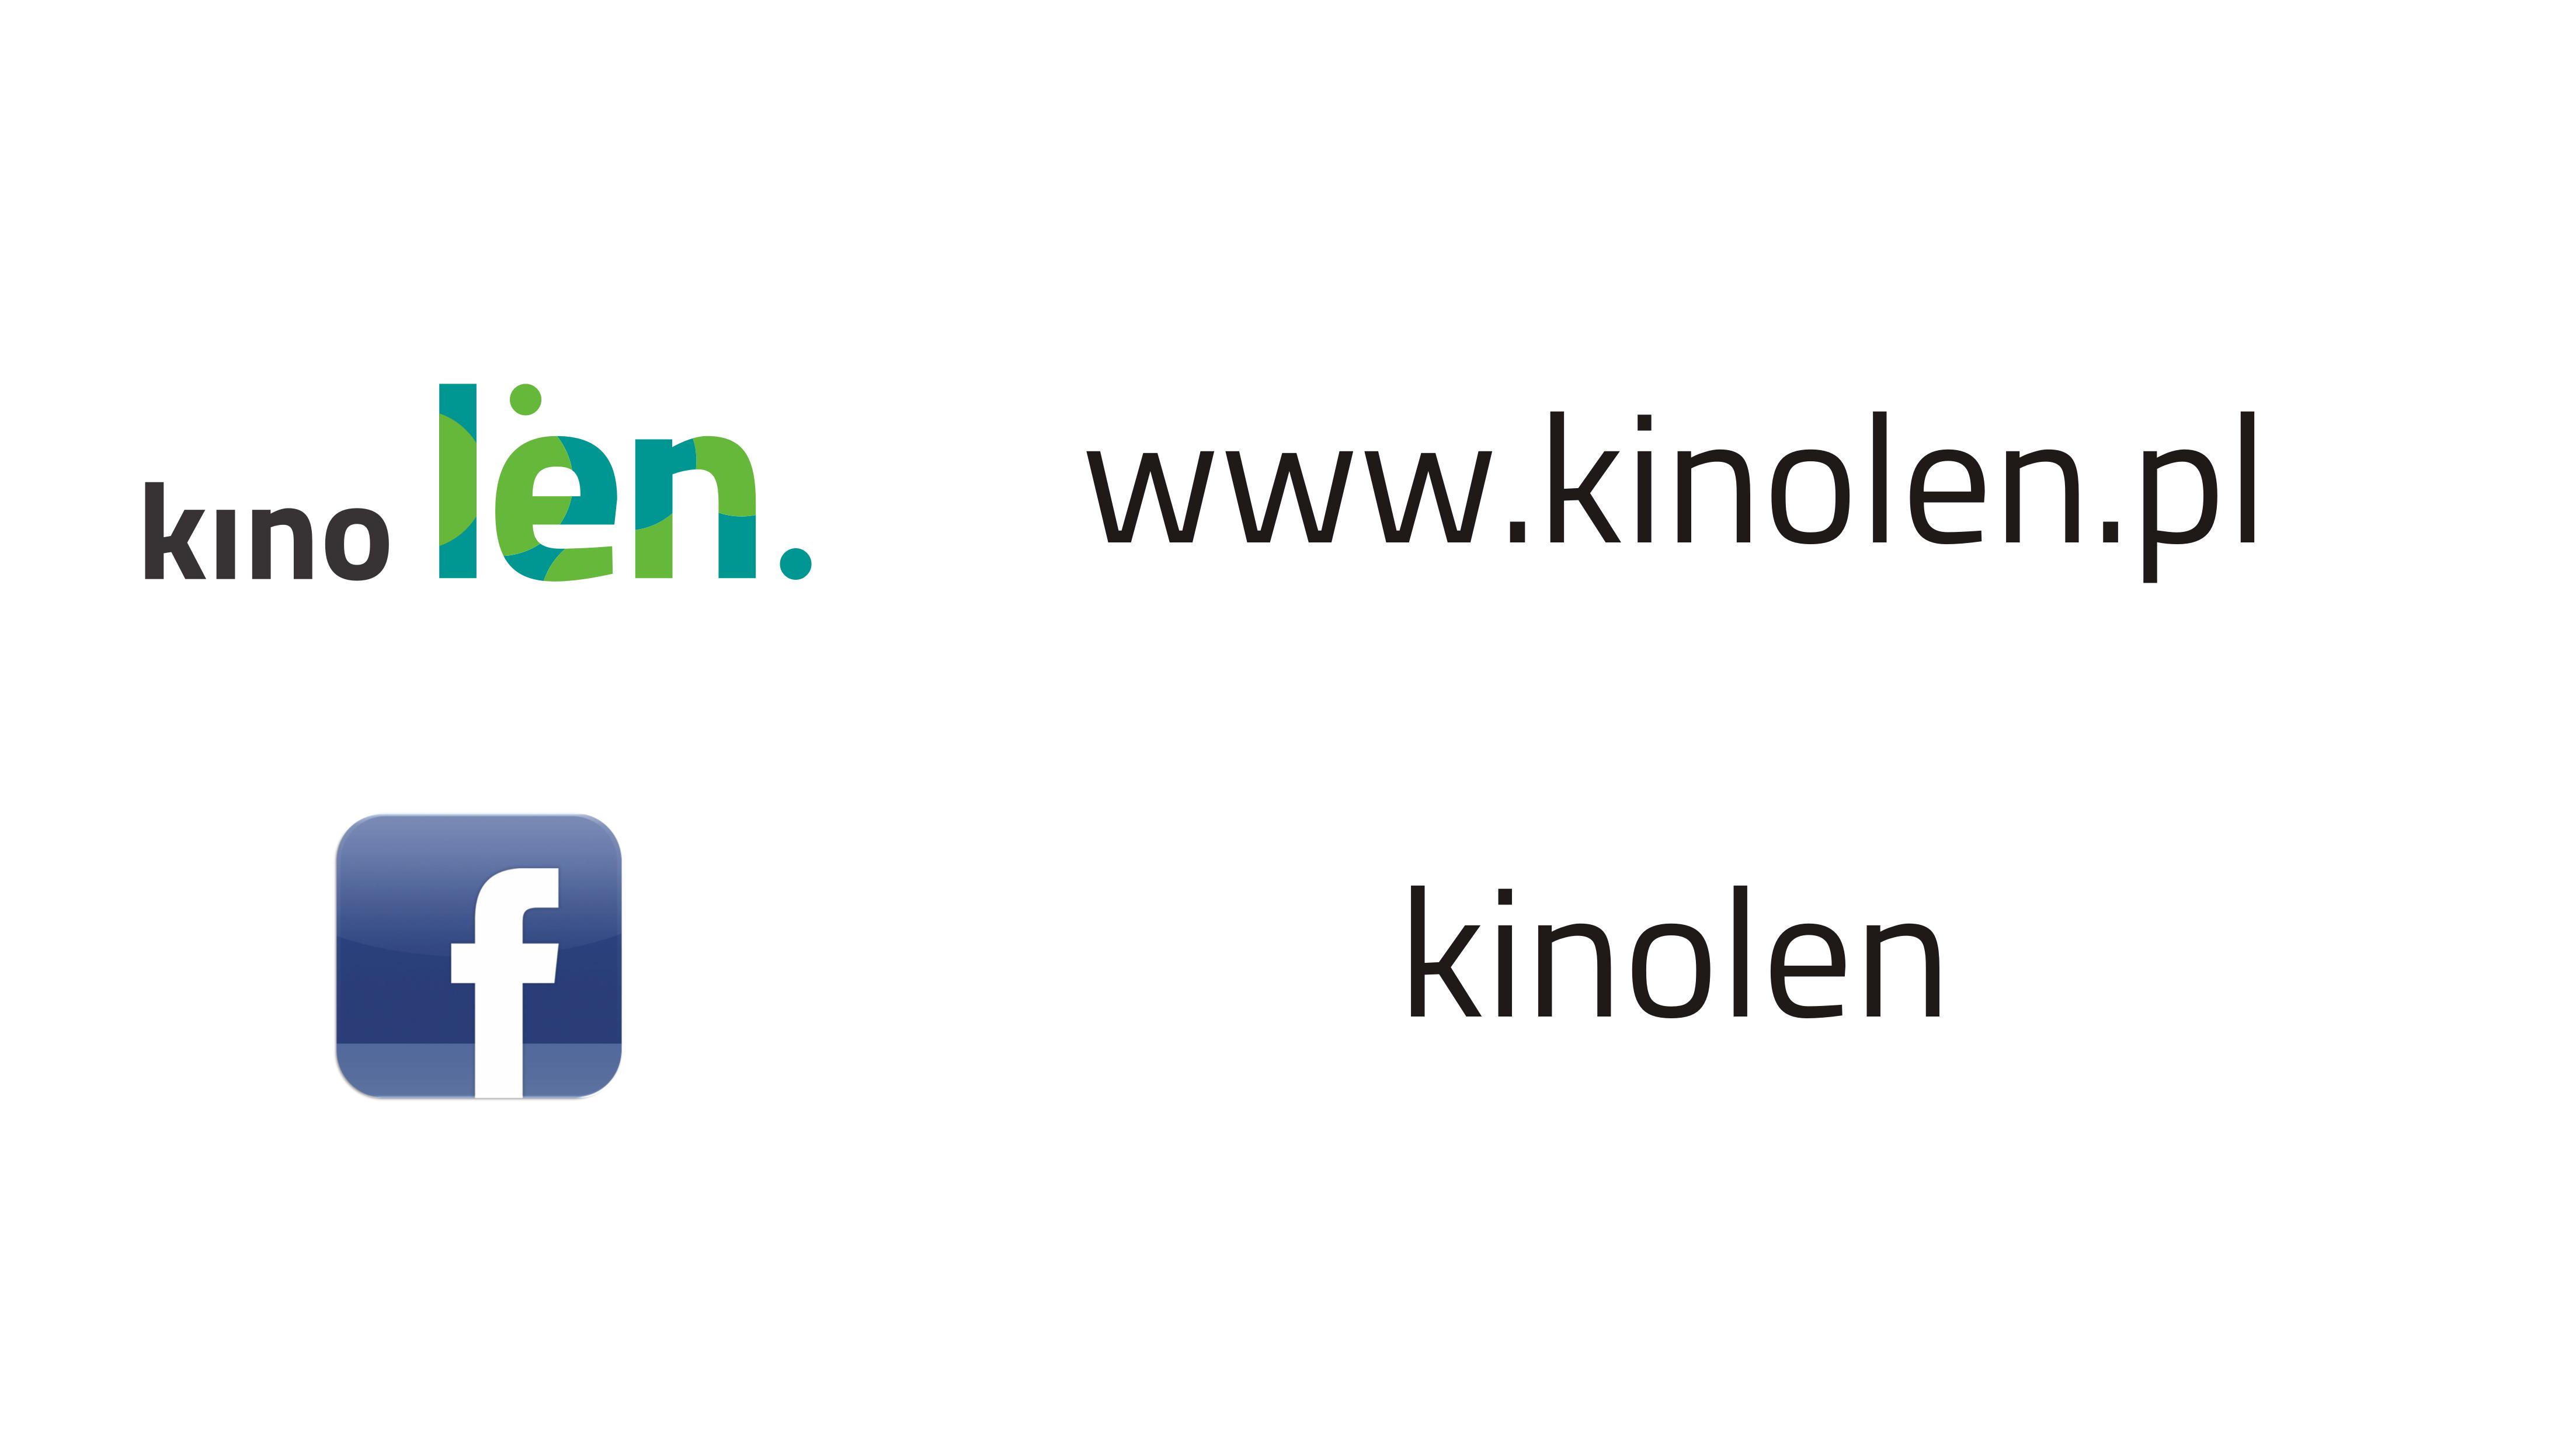 https://kinolen.pl/wp-content/uploads/2017/12/a.png